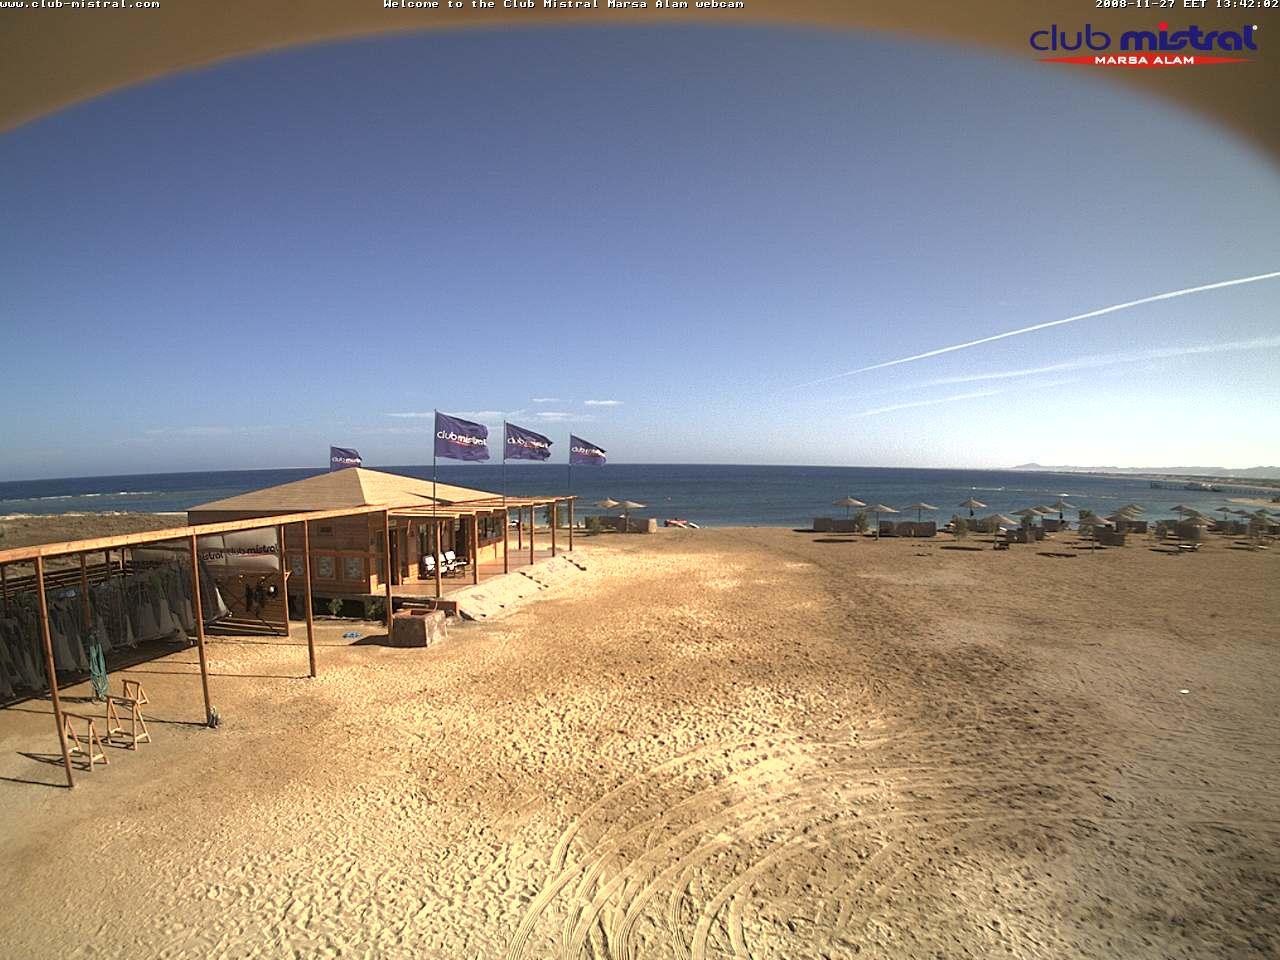 Beach of Marsa Alam photo 3